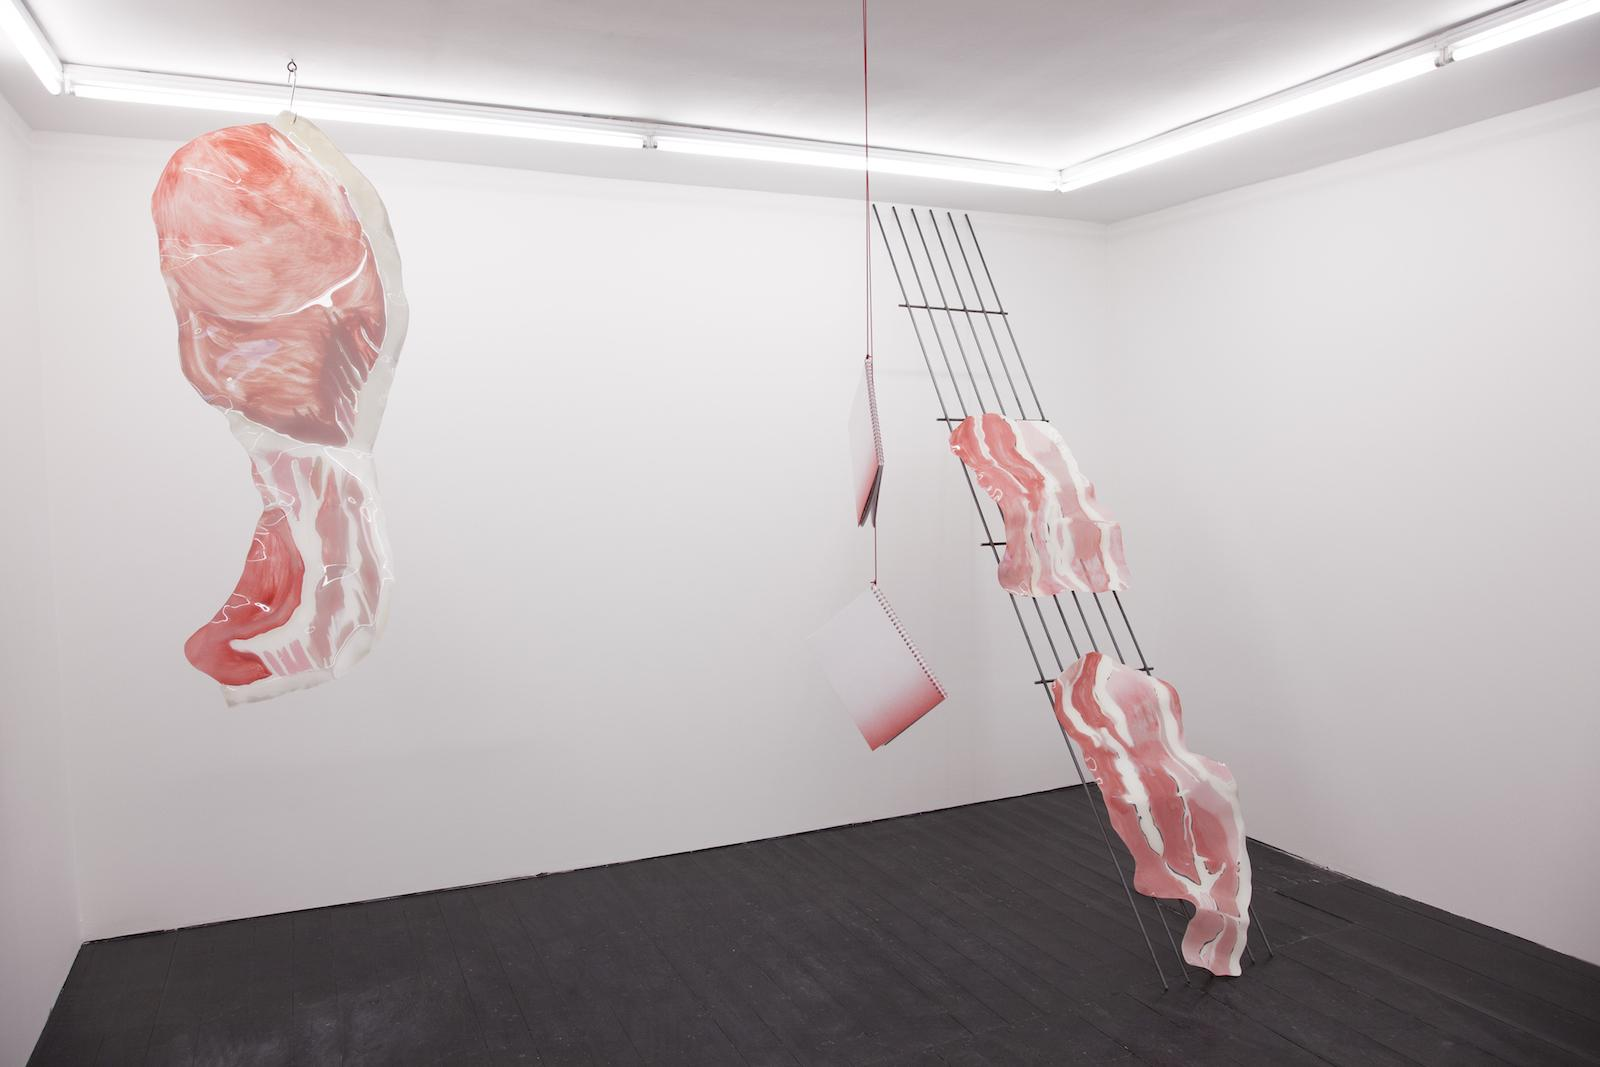 Kasia Fudakowski installation view at ChertLüdde